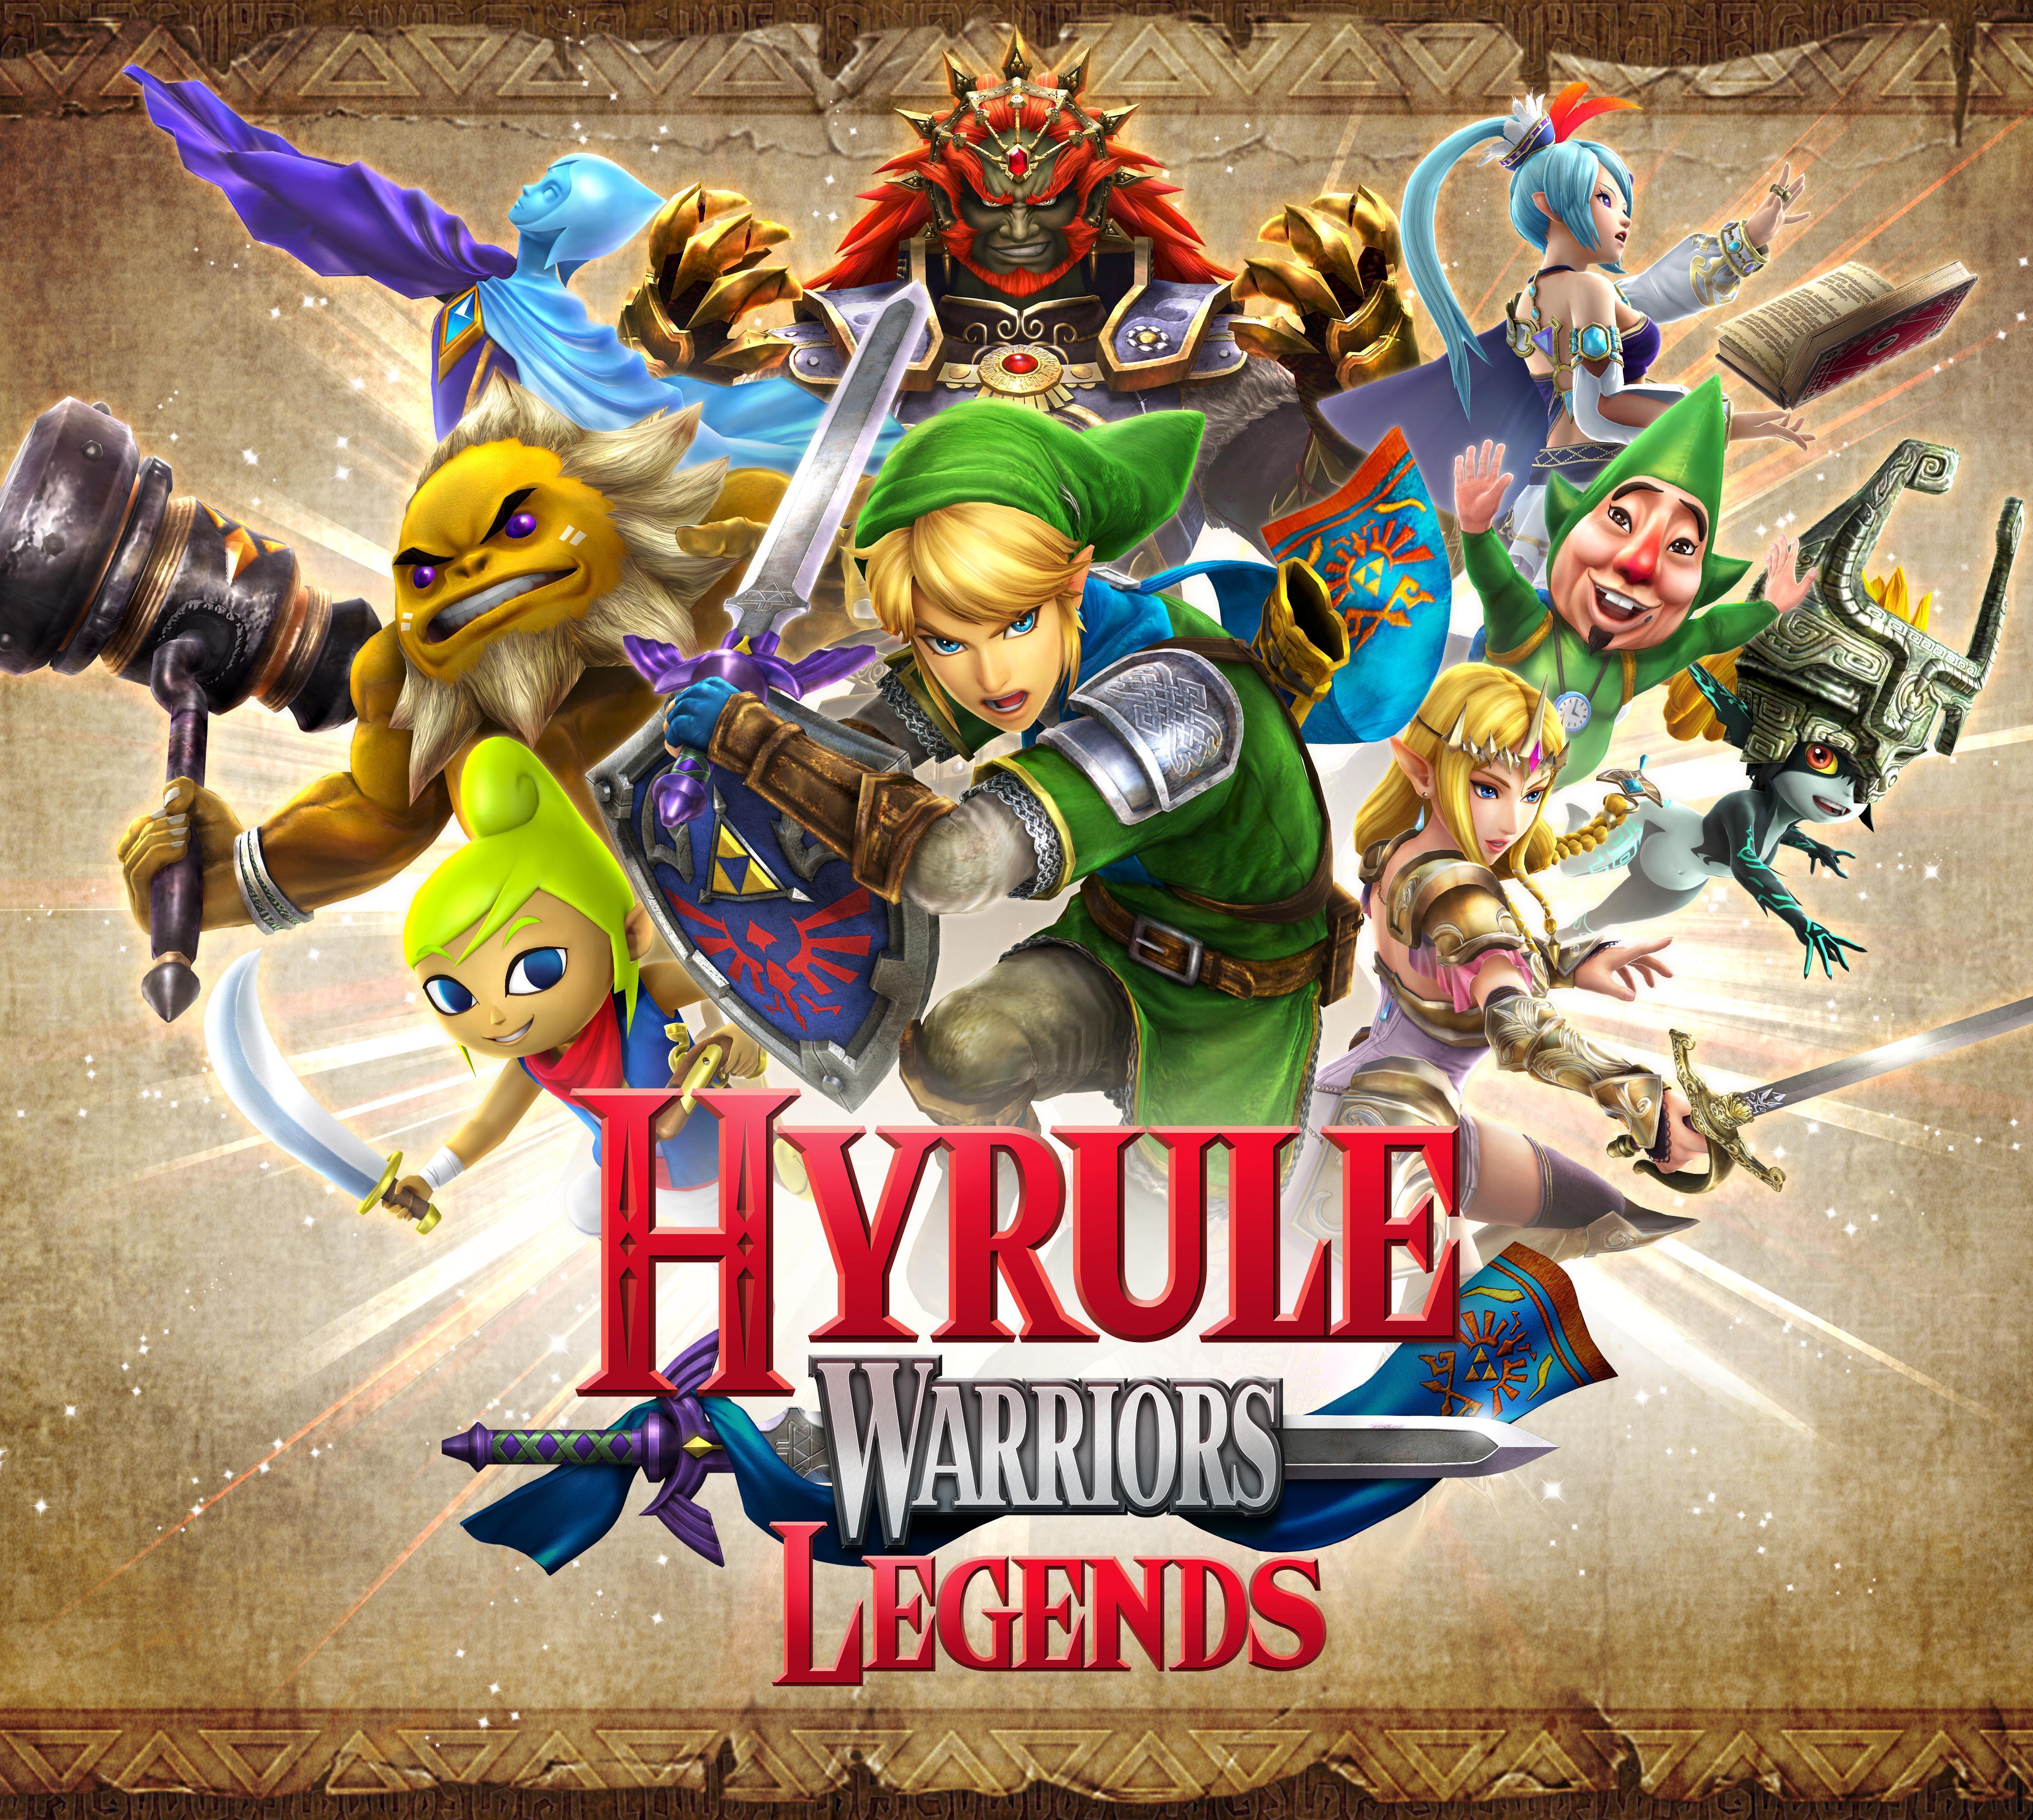 Hyrule Warriors Backgrounds, Compatible - PC, Mobile, Gadgets| 4467x4000 px